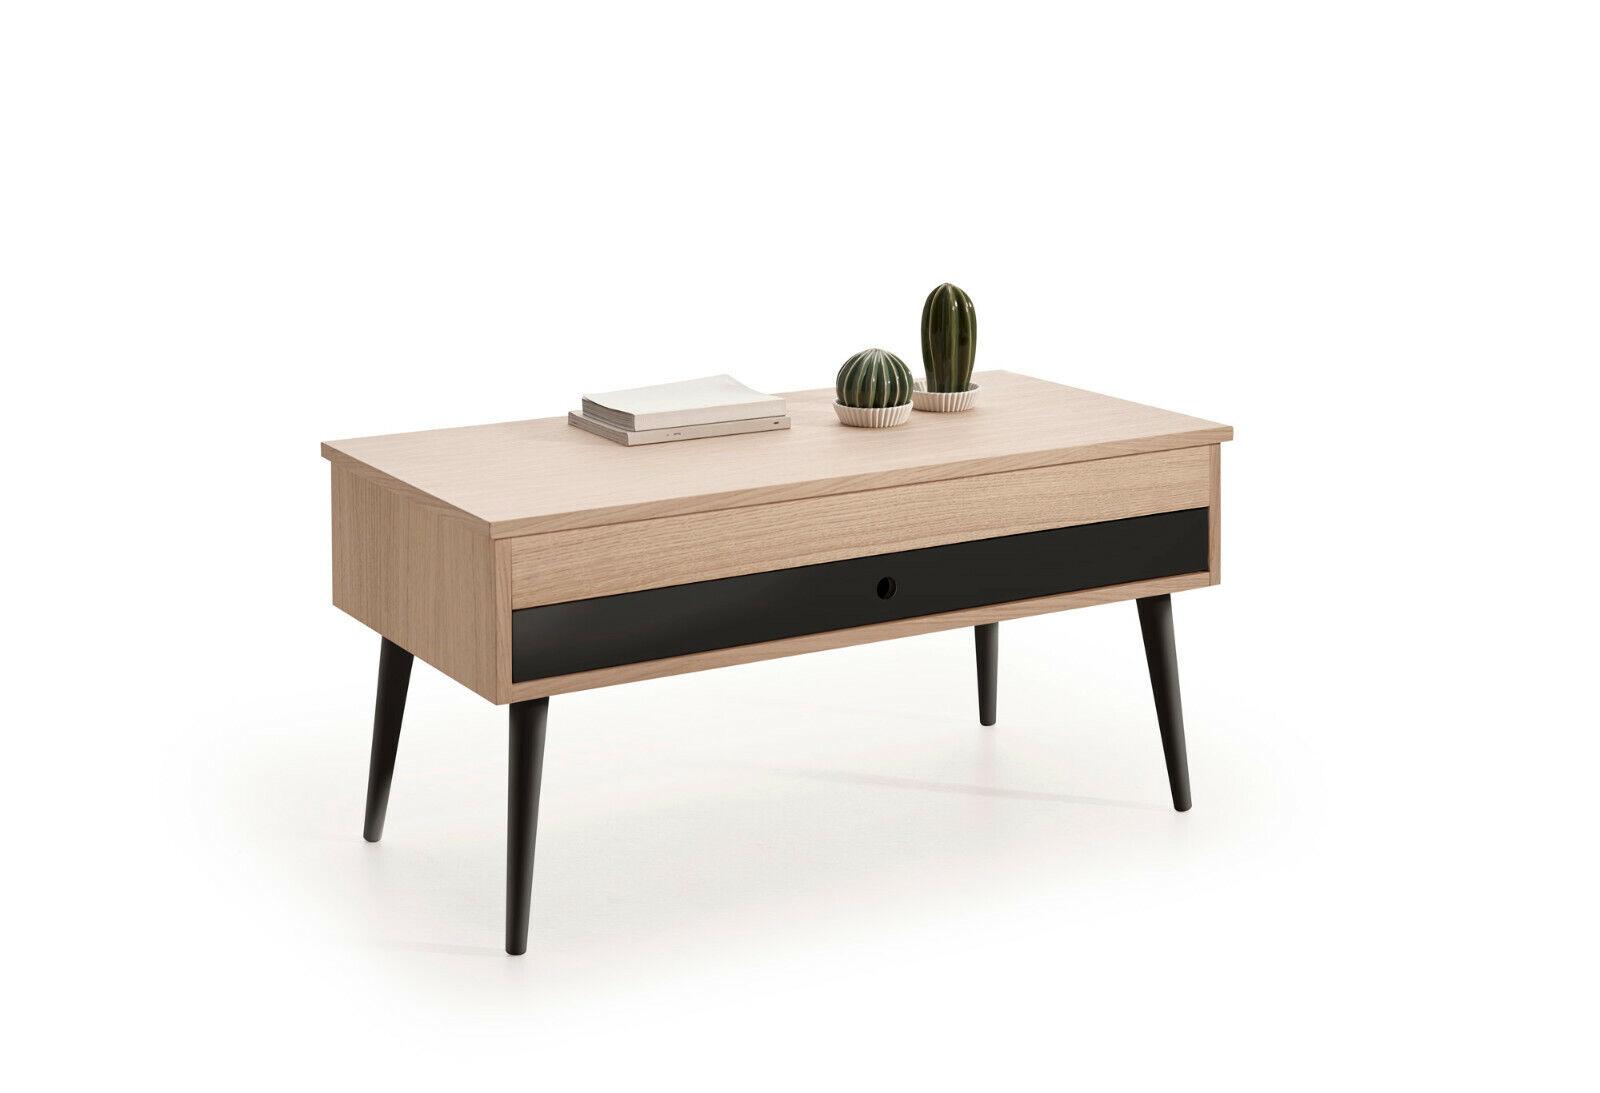 Hogar24- Mesa de Centro Elevable con cajón deslizante acabado color Roble-Negro.